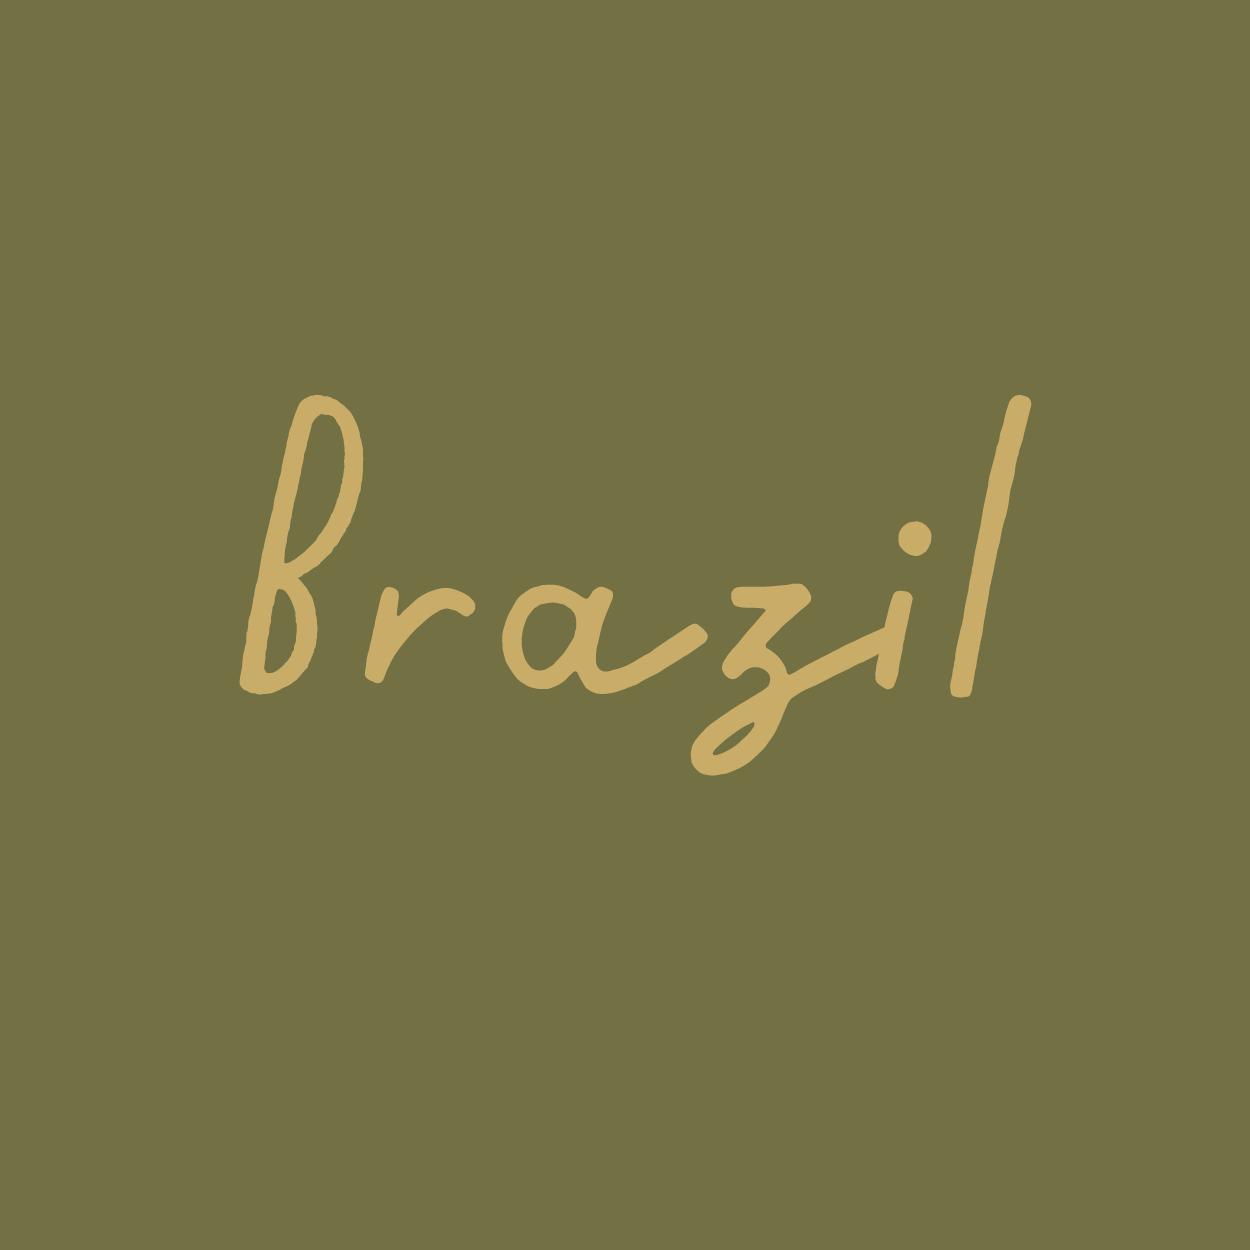 brazil-01.png